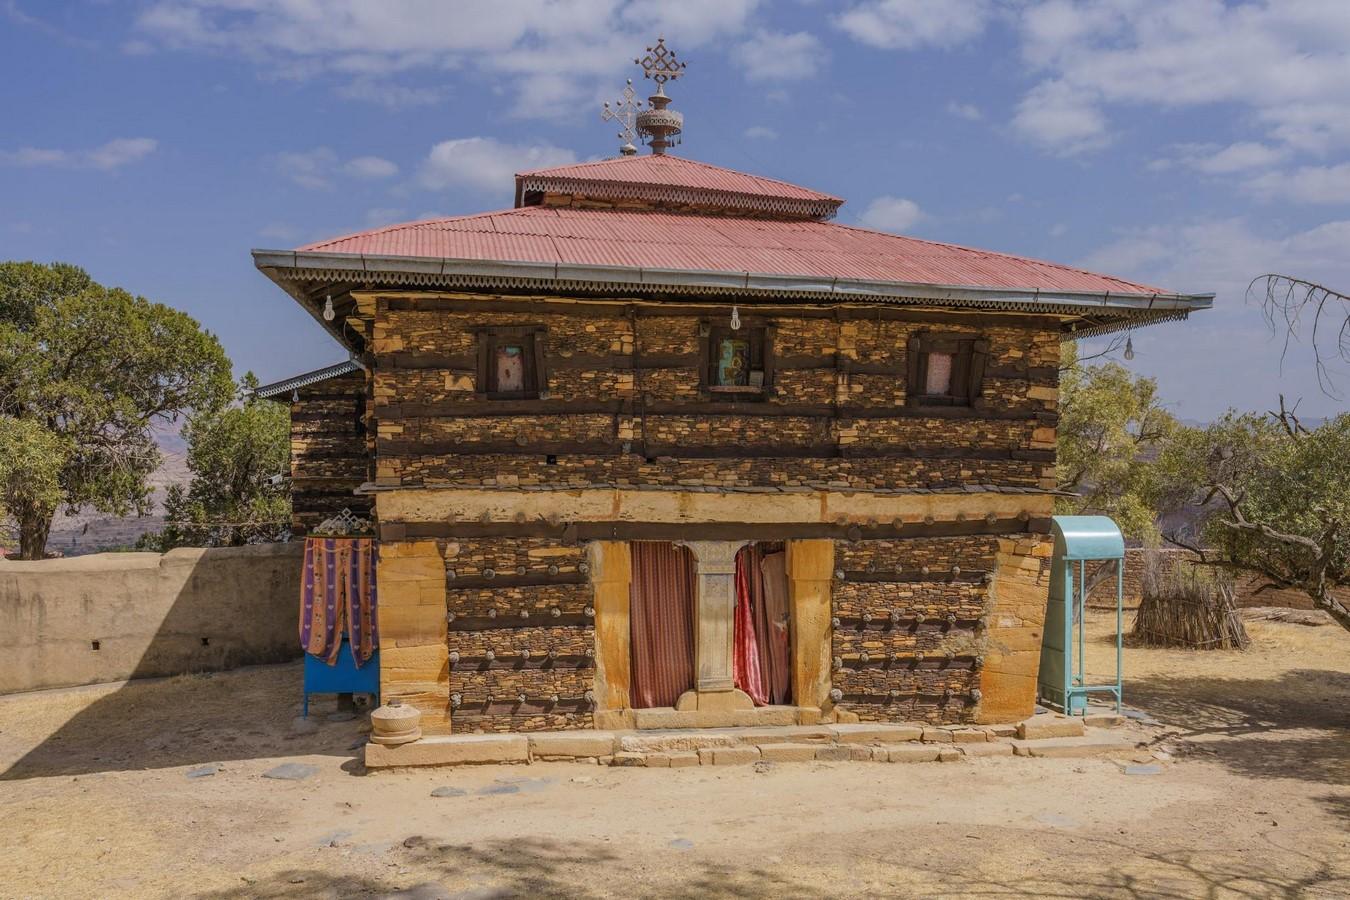 Aksumite architecture: Architecture of Ethiopia - Sheet6